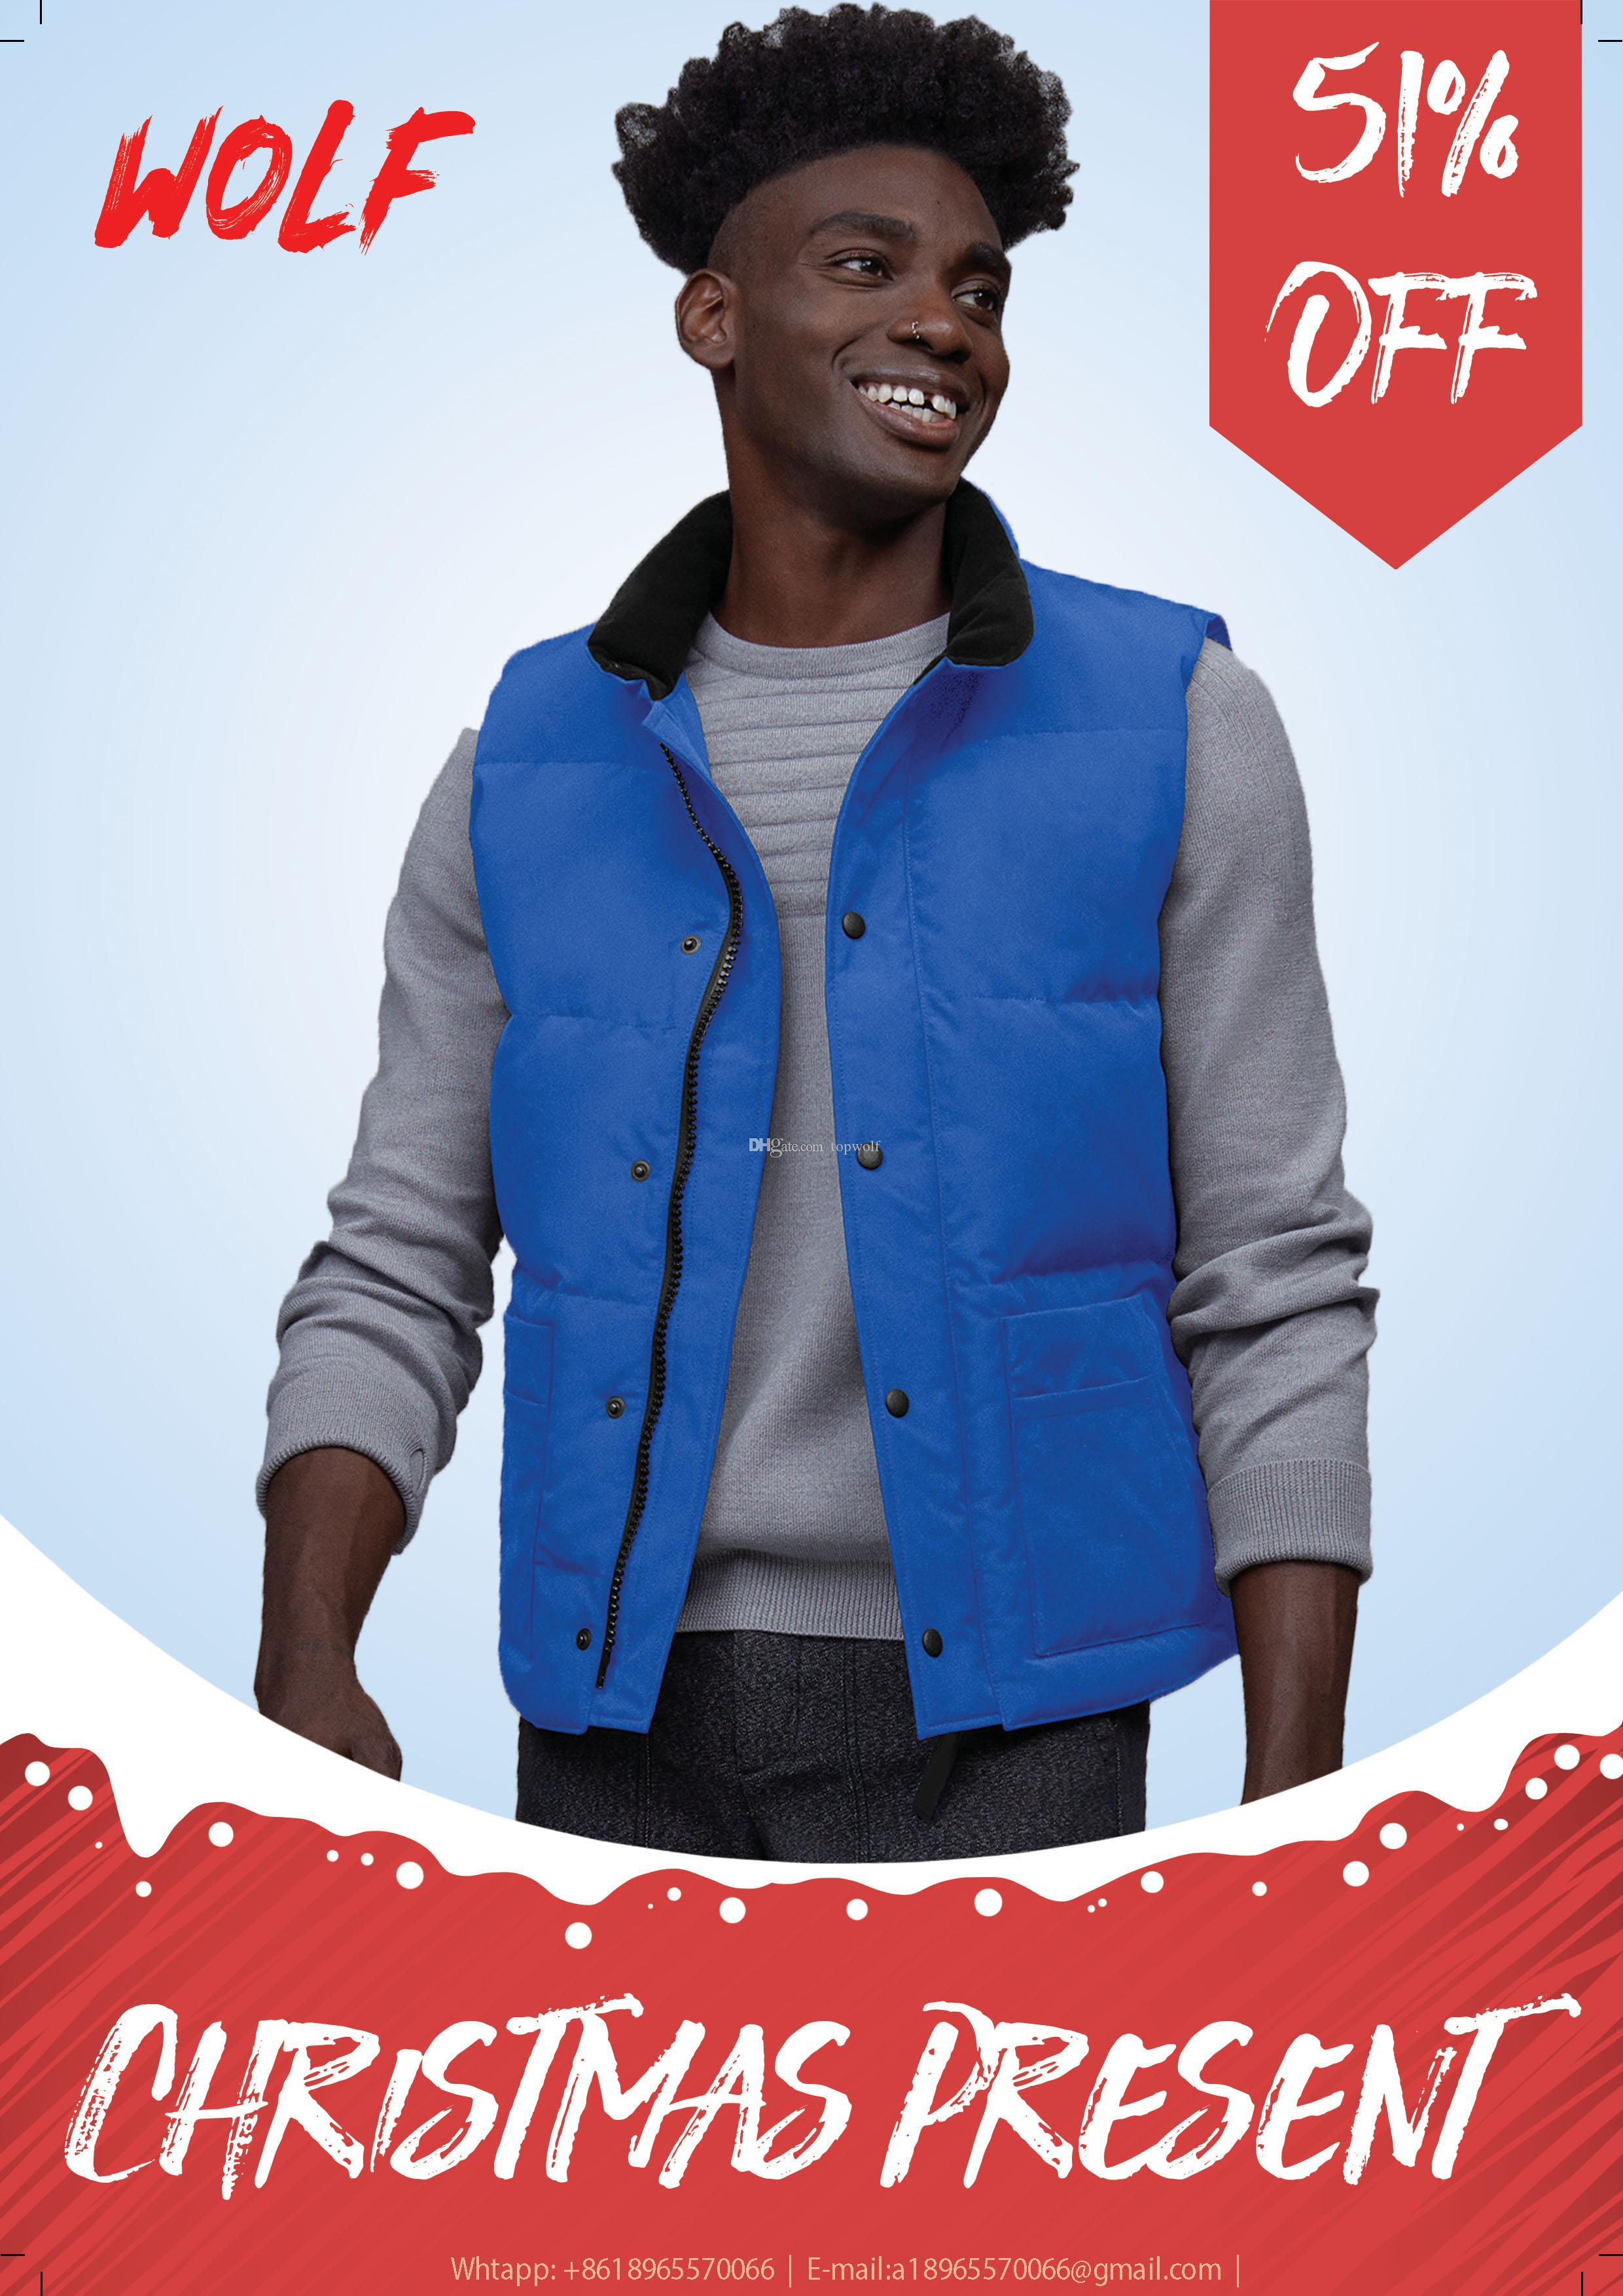 Top Mens Down Men Women Stylist Winter Jacket Coat Mens High Quality Casual Vests Mens Stylist Down 4 Colors Size S-XL